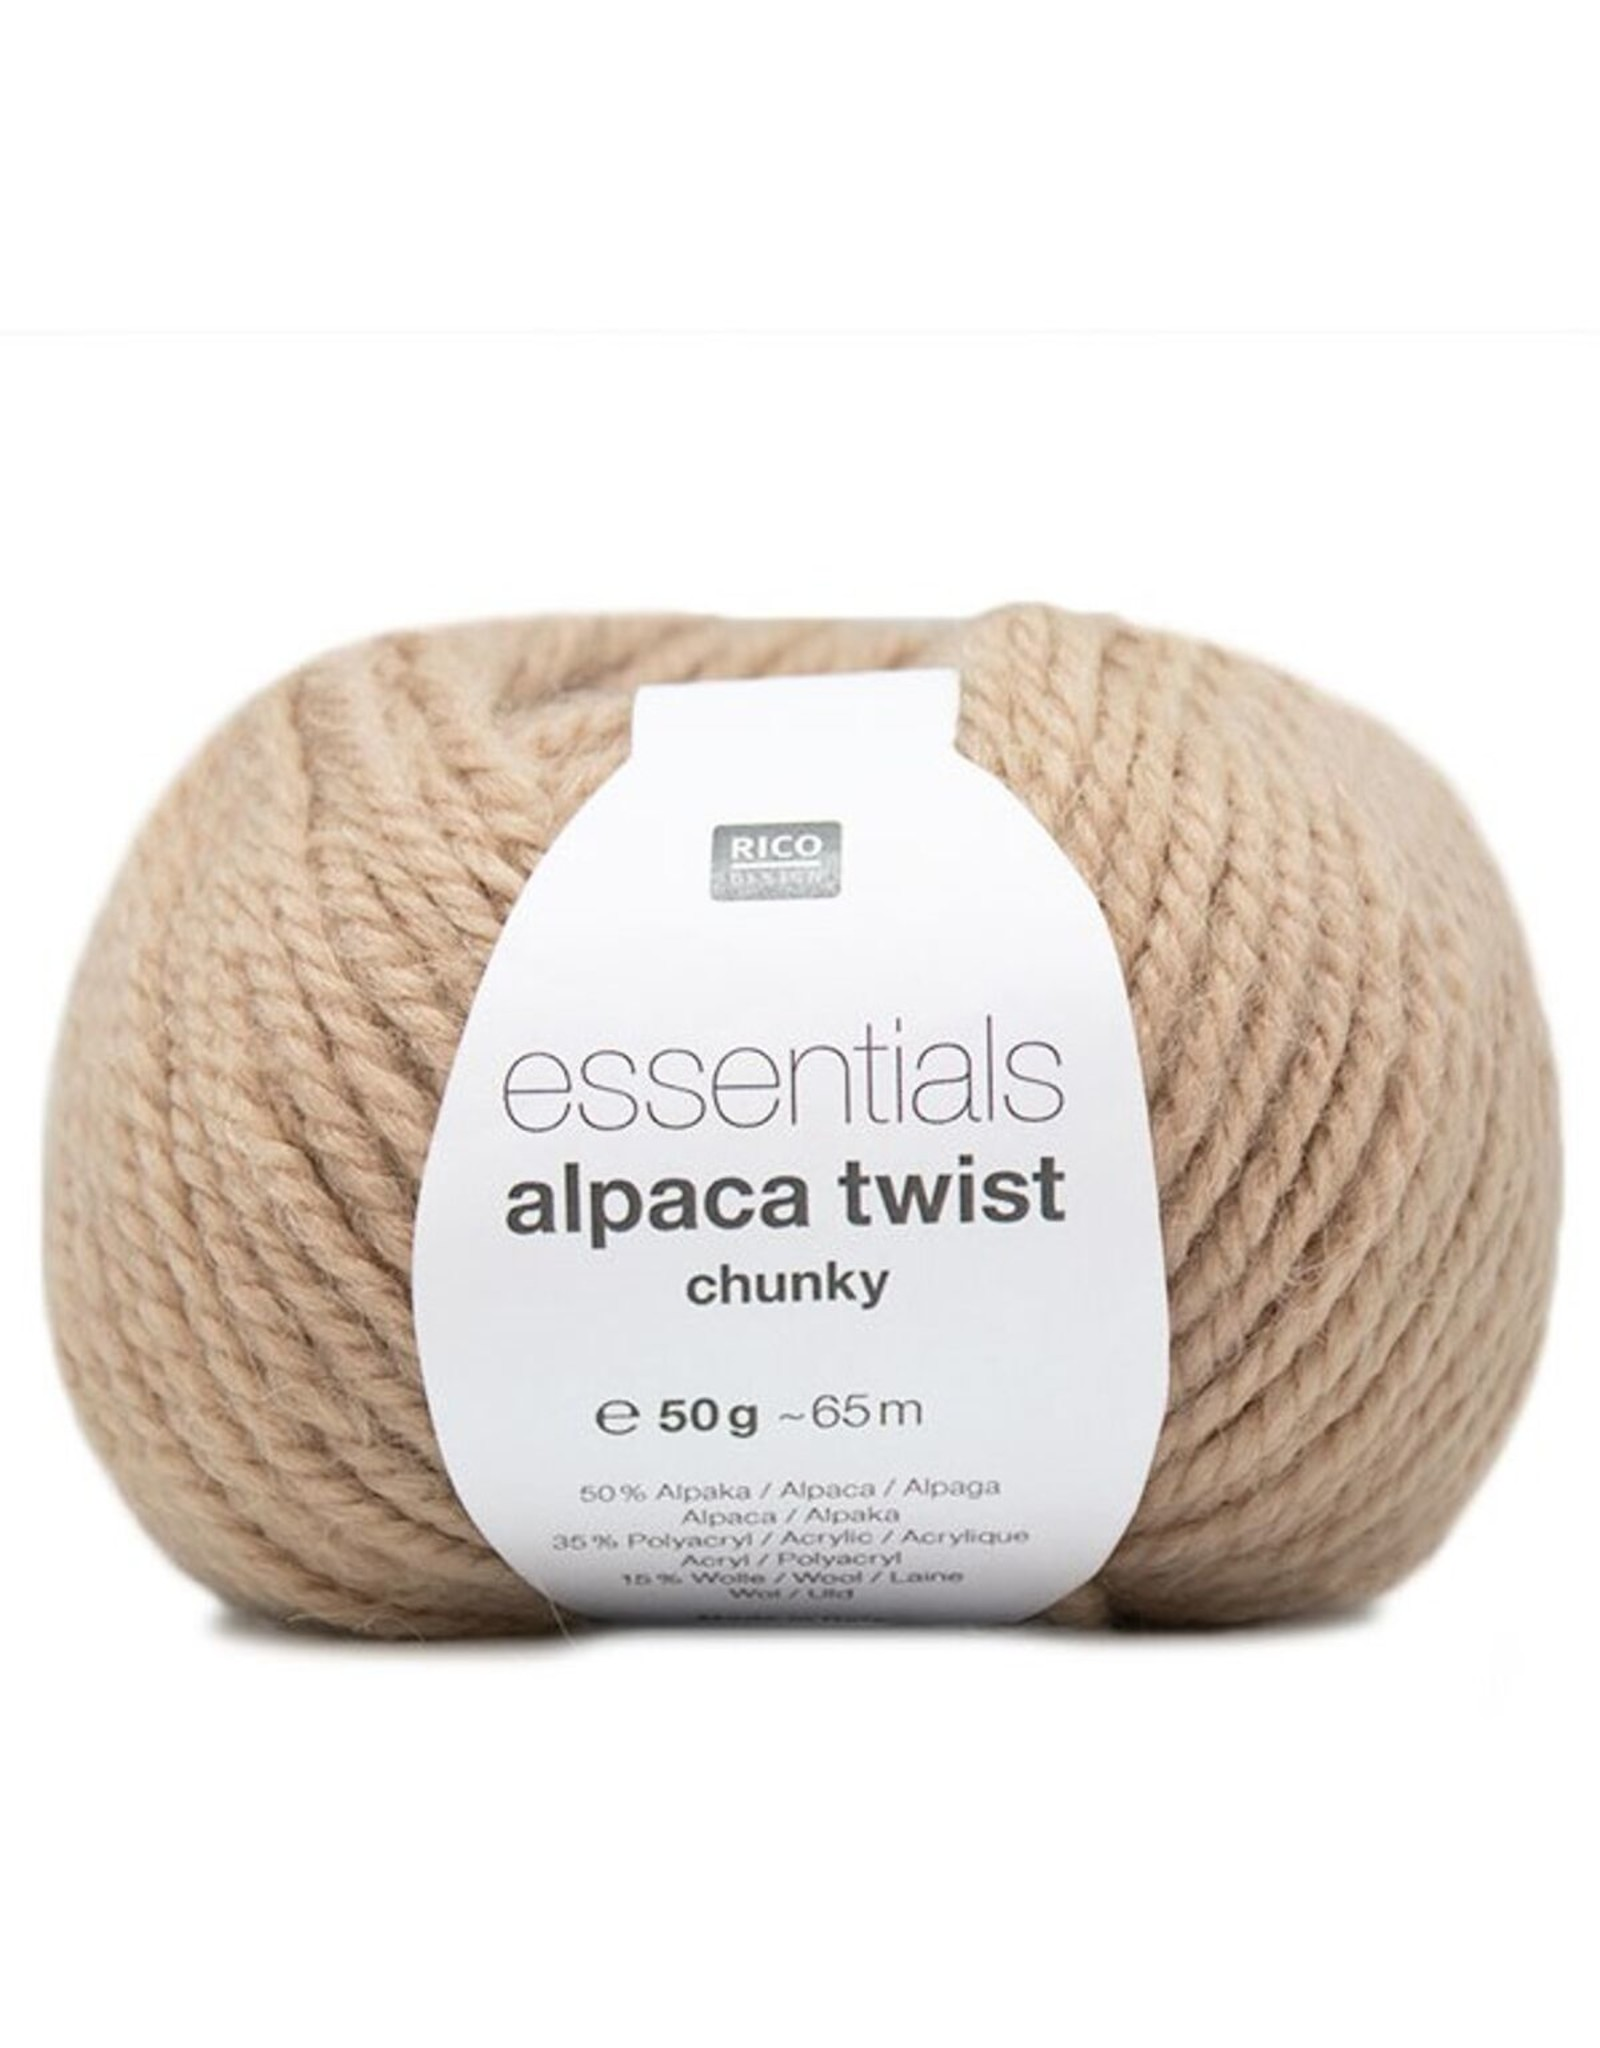 Rico Rico Essential Alpaca Twist Chunky